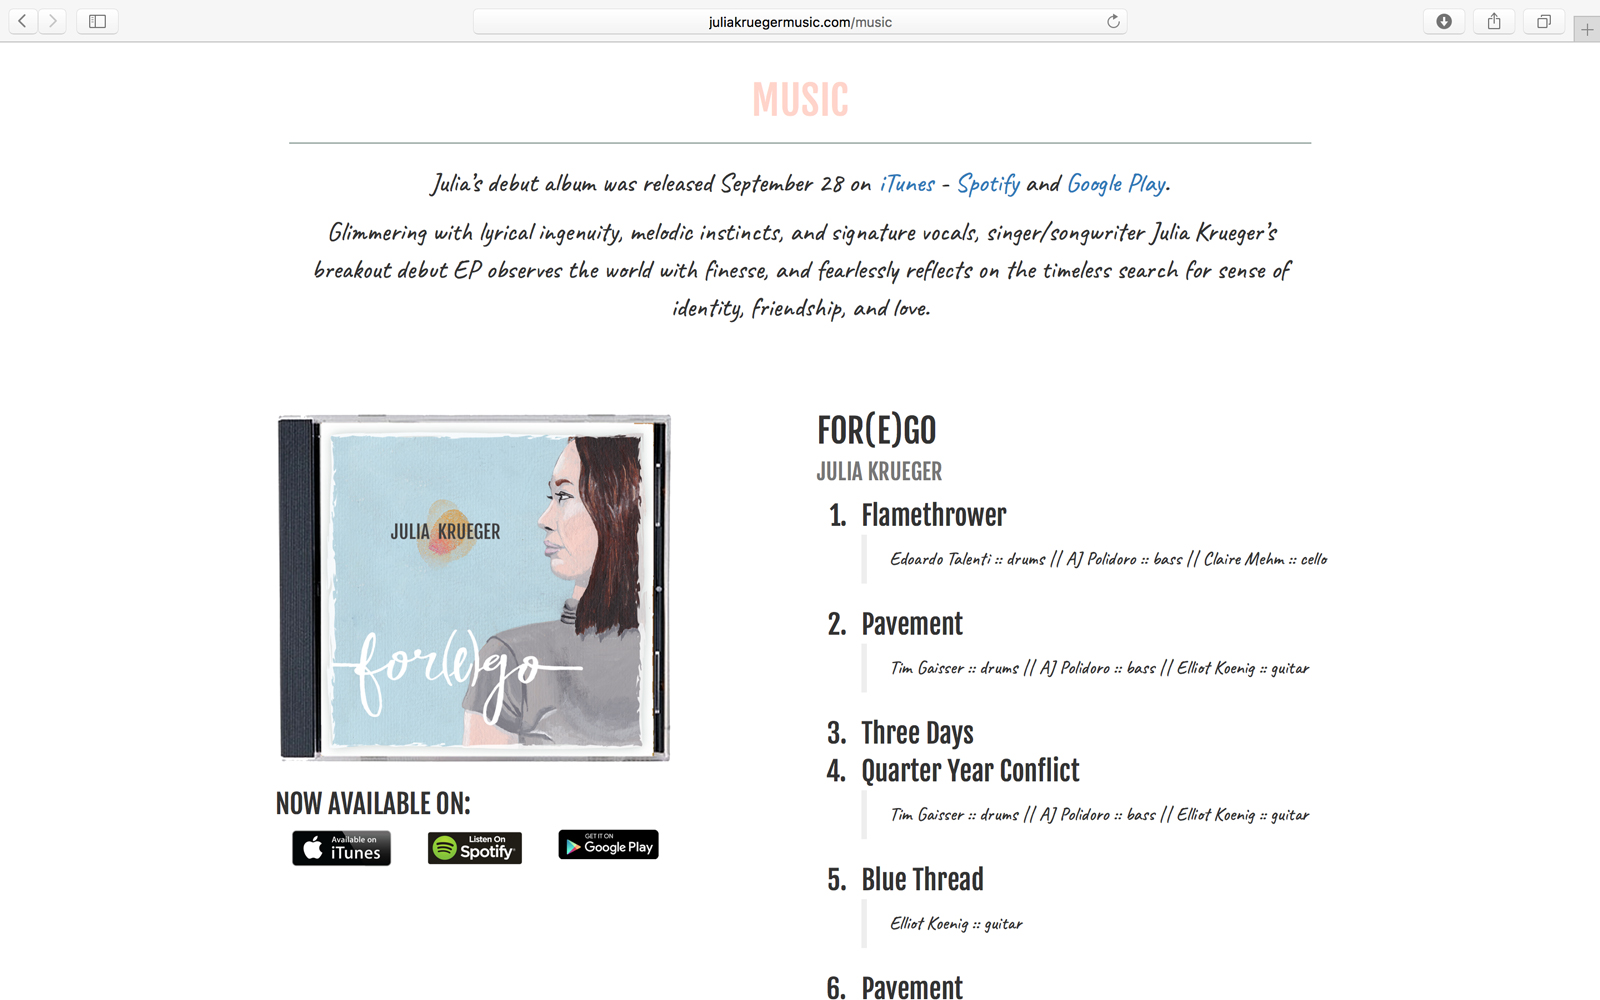 Julia Krueger Website Album Purchase Page